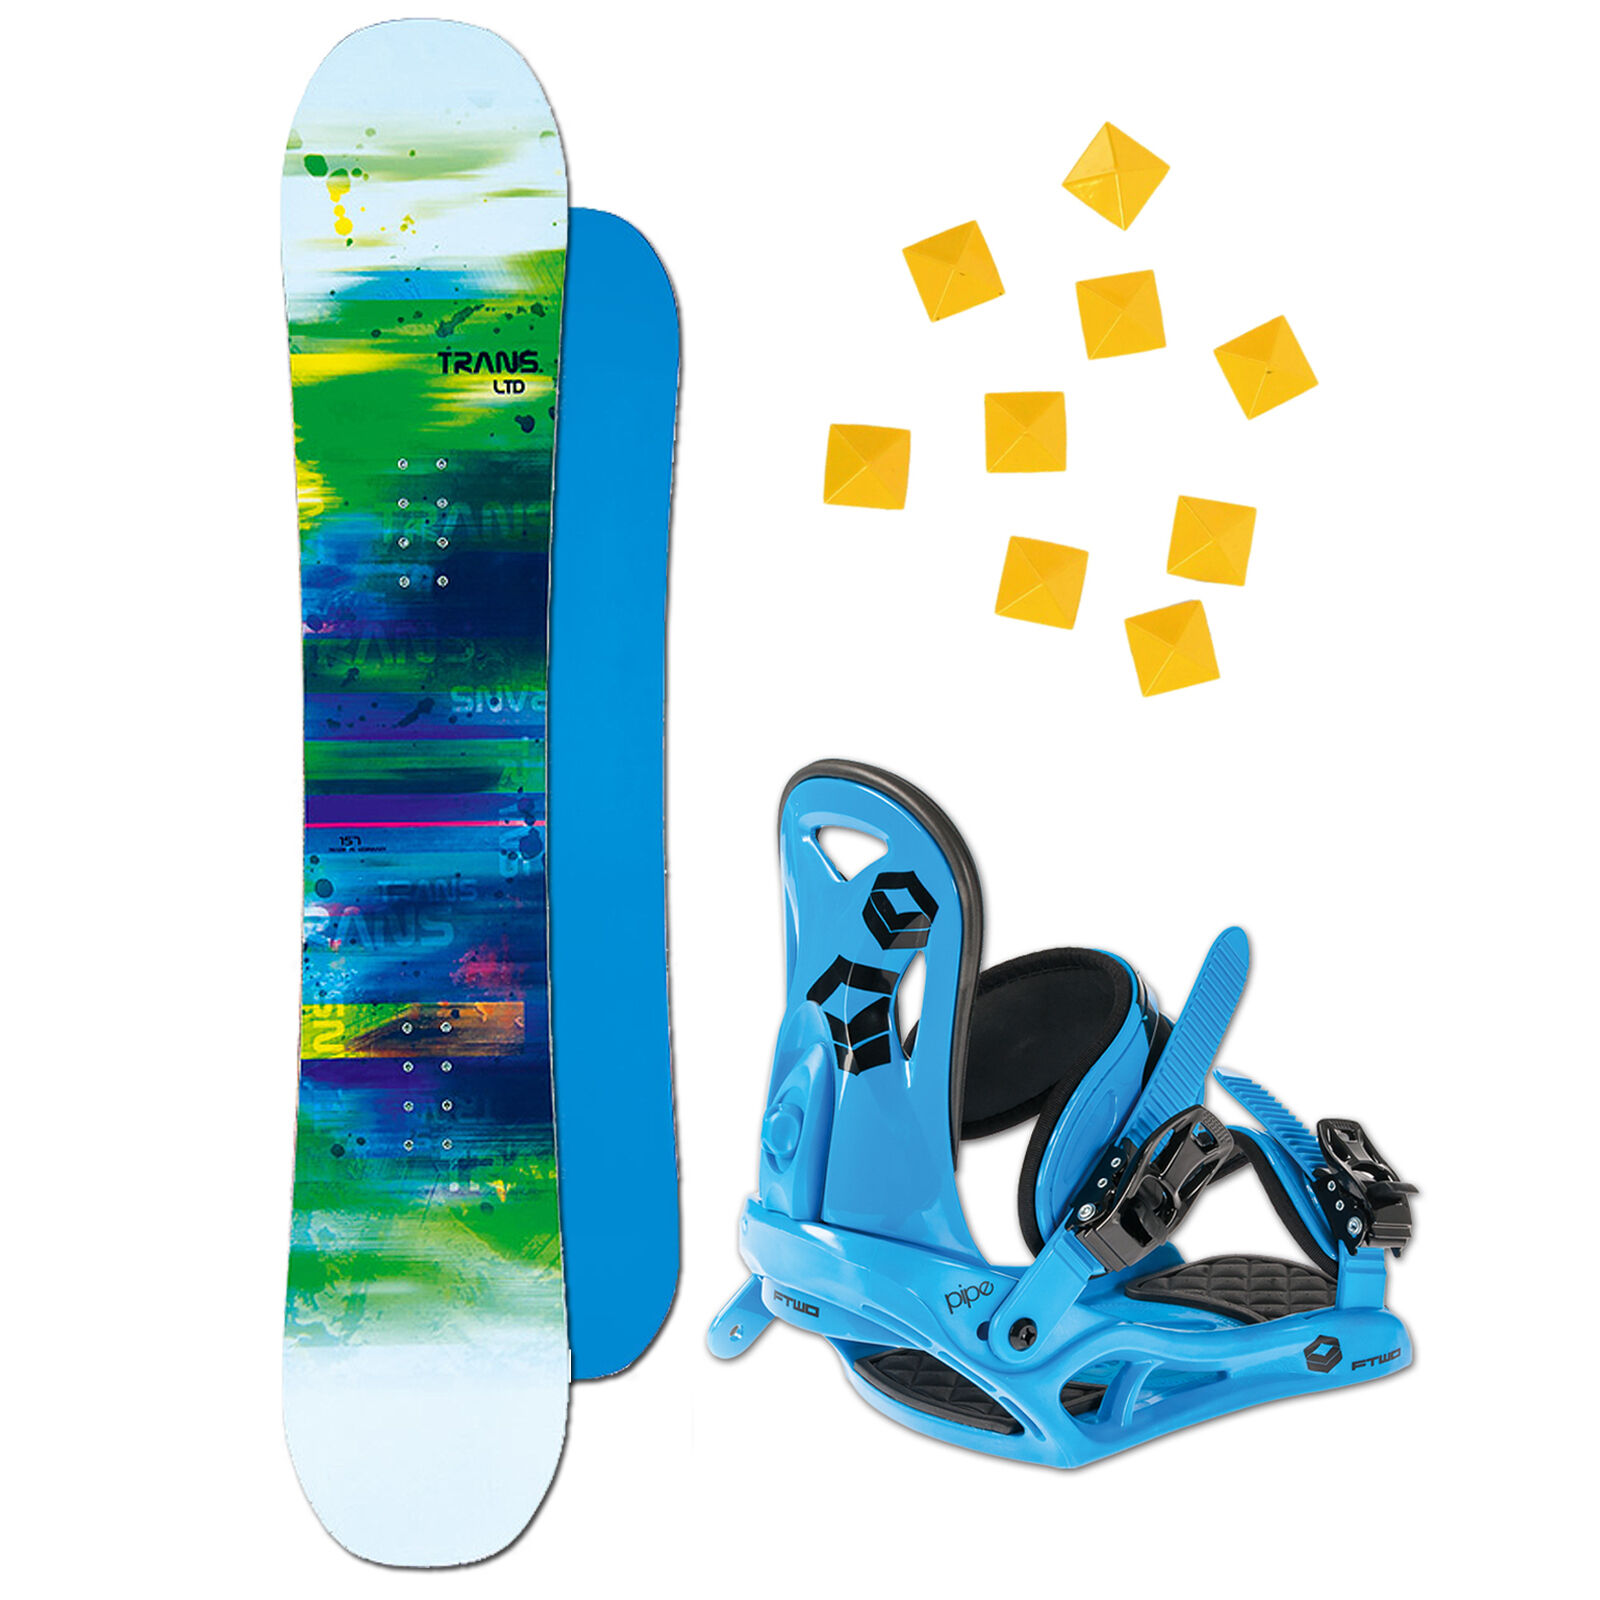 Men's Snowboard  Trans Ltd White 147 cm + Ftwo Pipe Binding M+ Pad